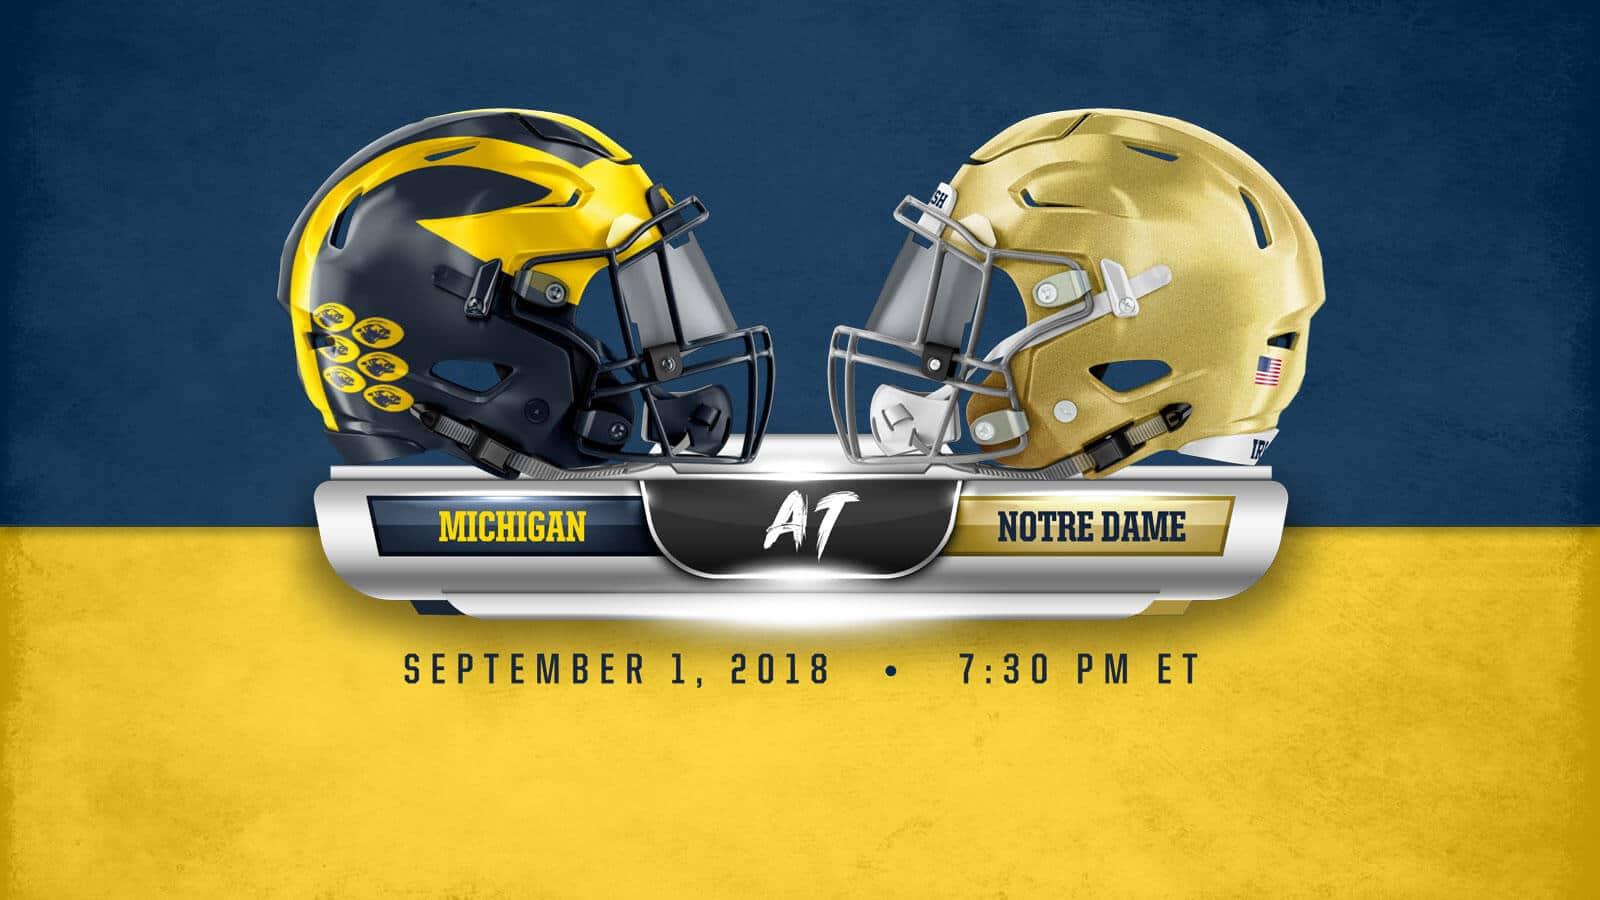 Michigan vs notre-dame betting lines pliskova schiavone betting expert nba